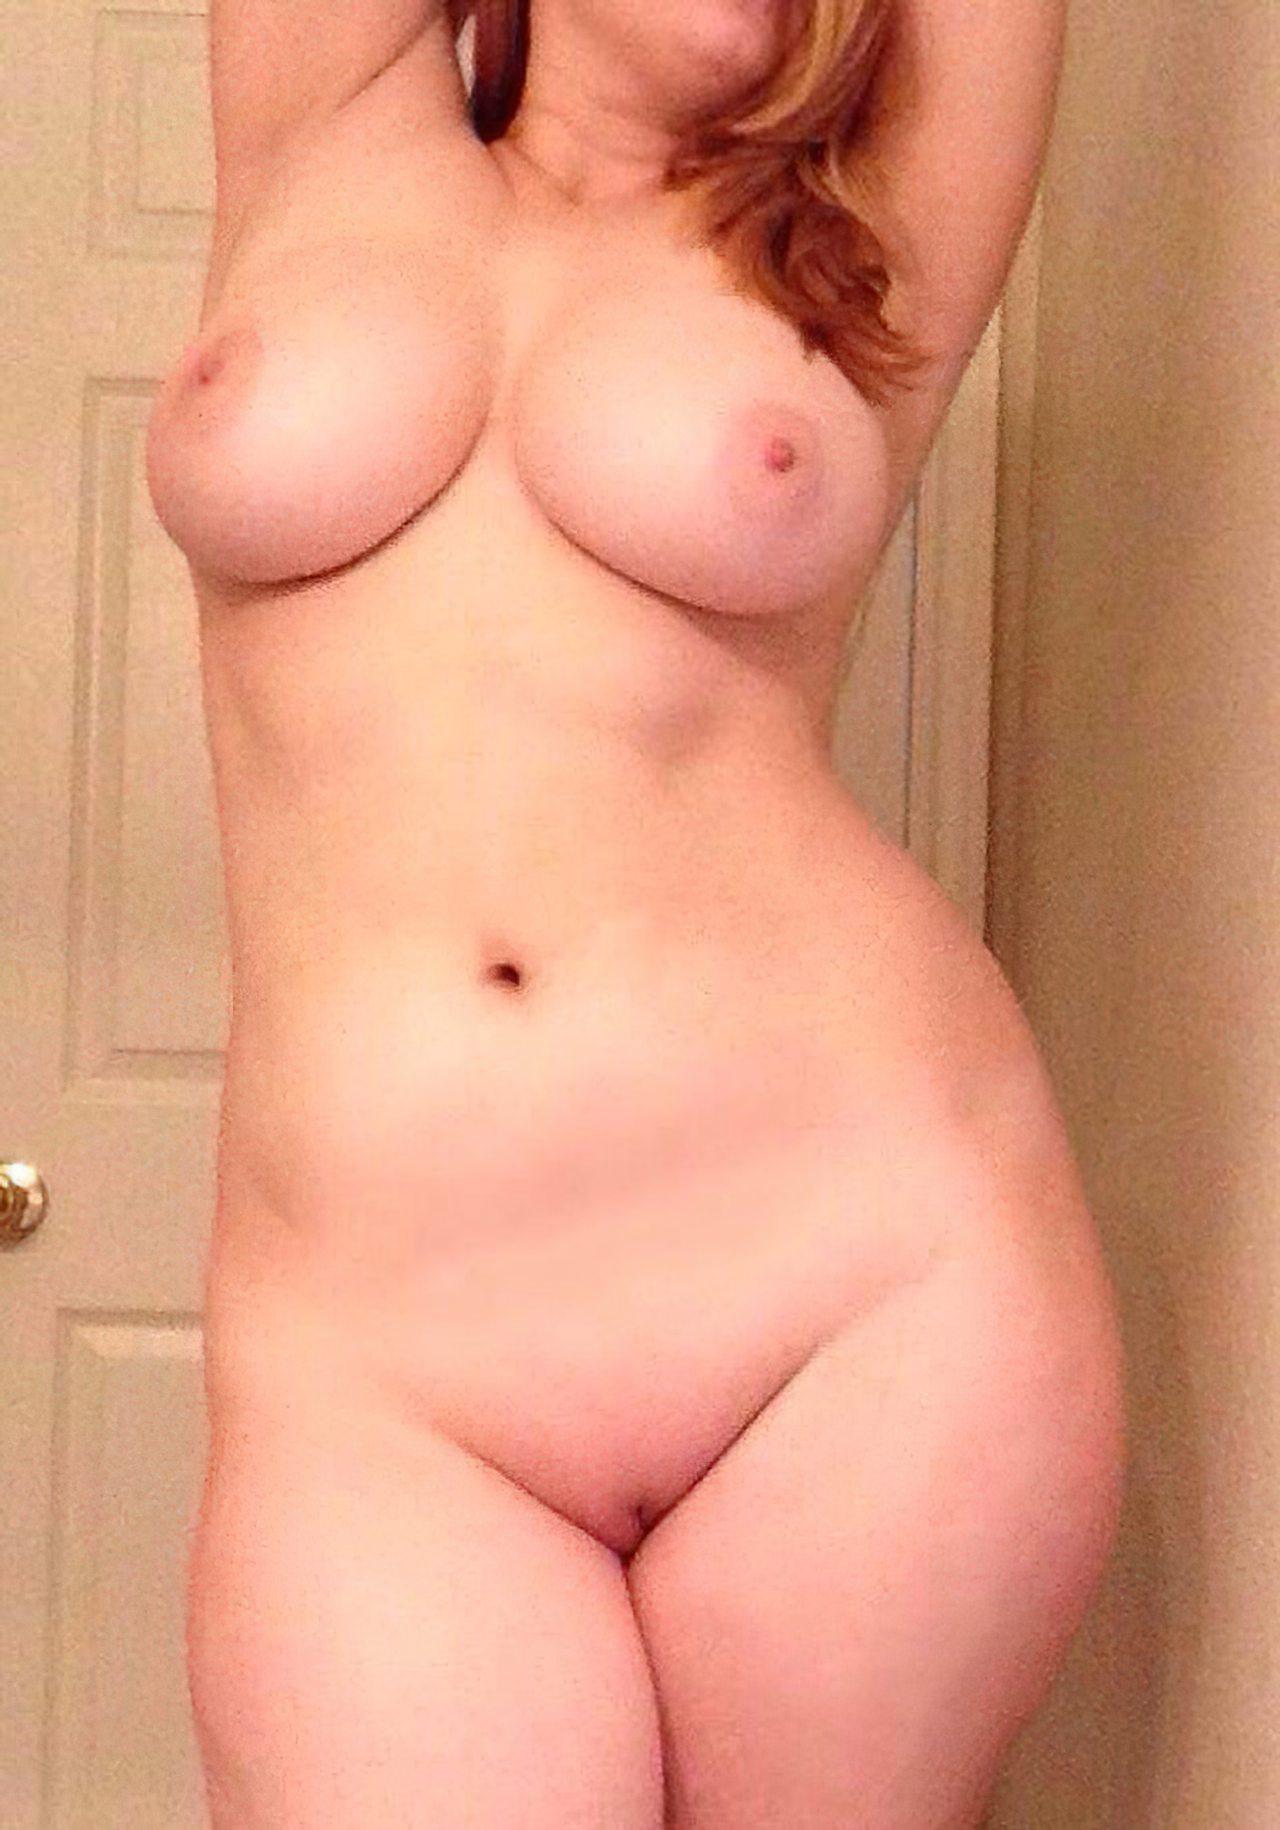 Striptease Antes de Sair (11)